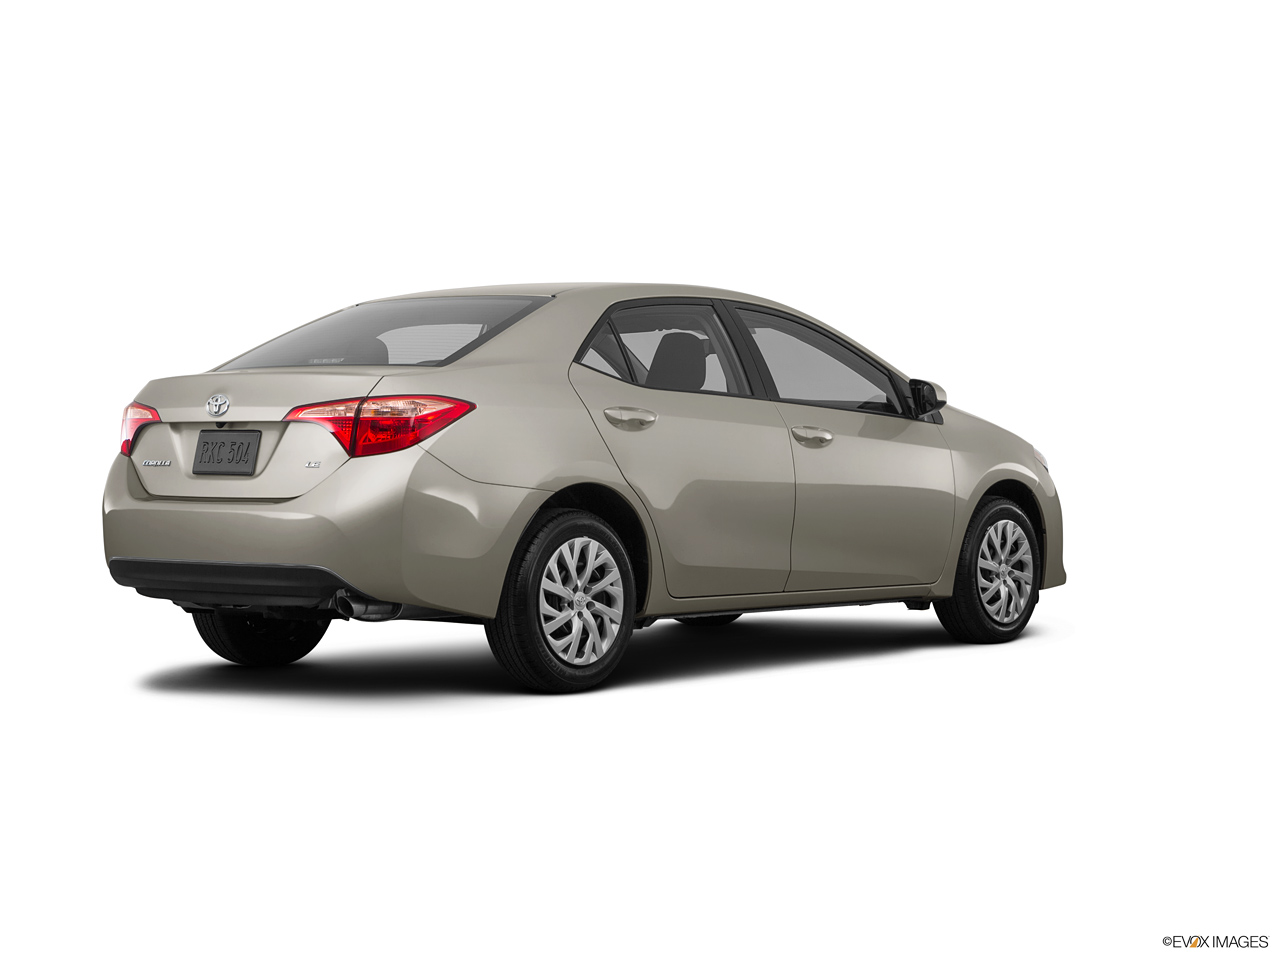 Kekurangan Toyota Corolla 2019 Perbandingan Harga